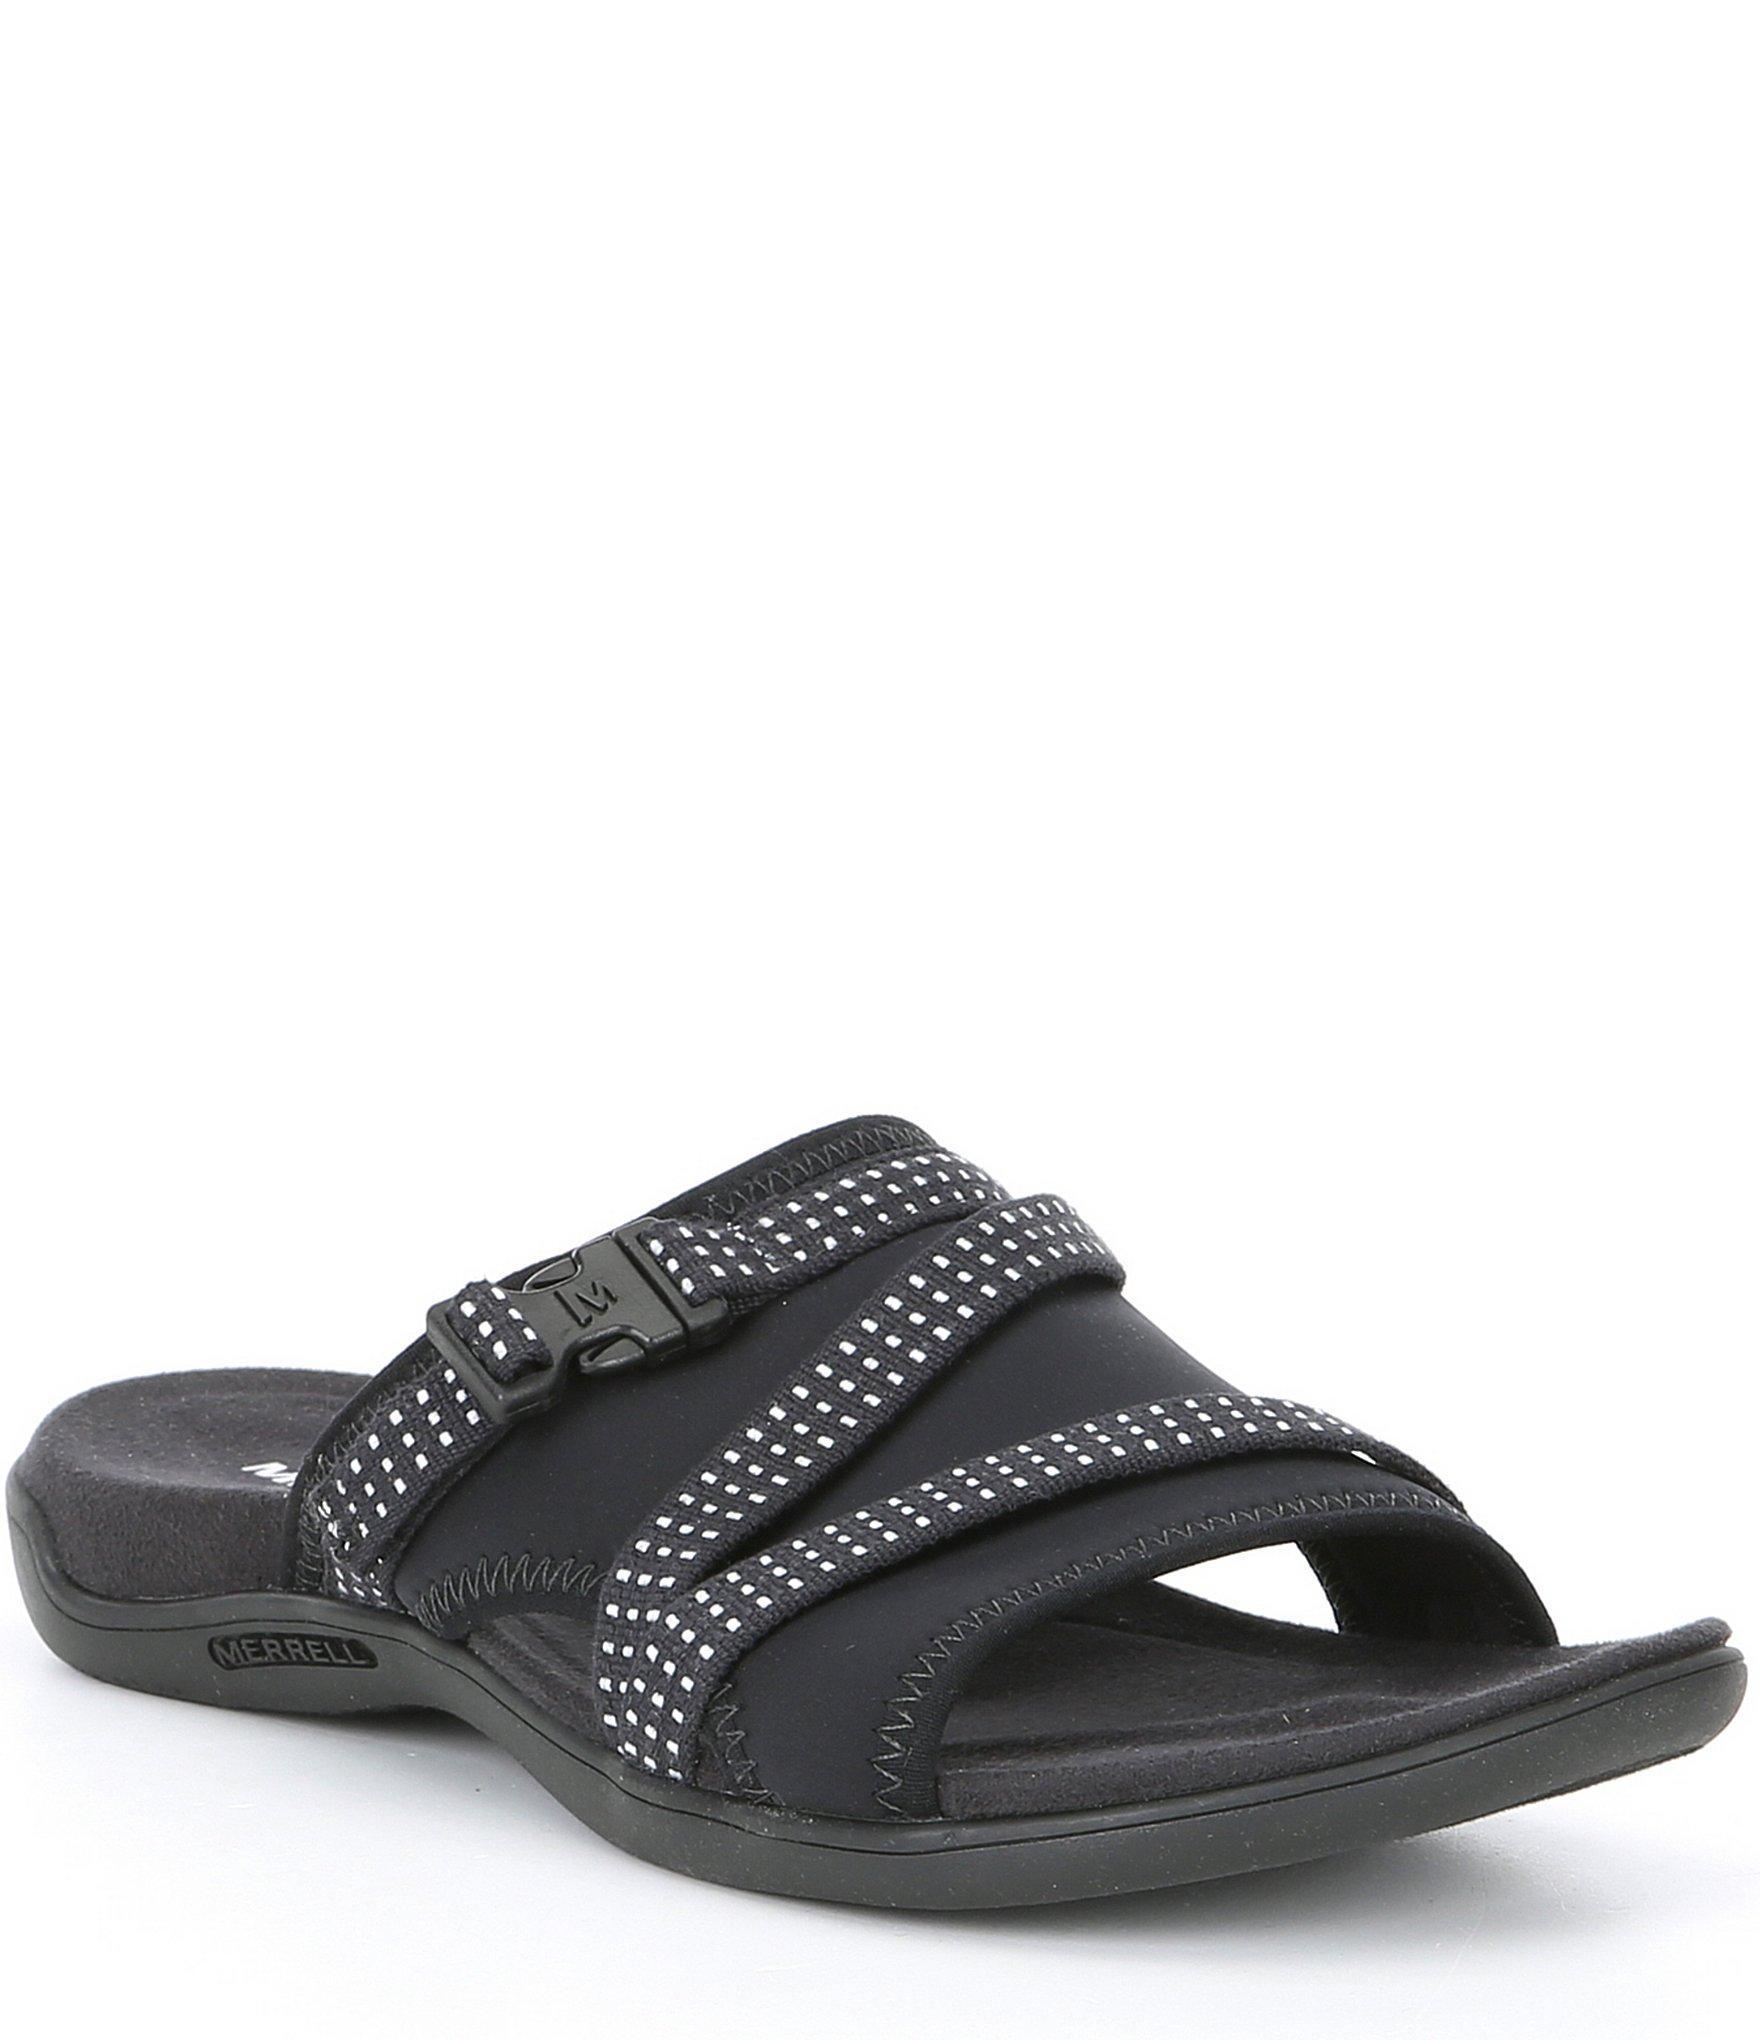 cbe4d0cc990e Lyst - Merrell District Muri Slide On Sandals in Black